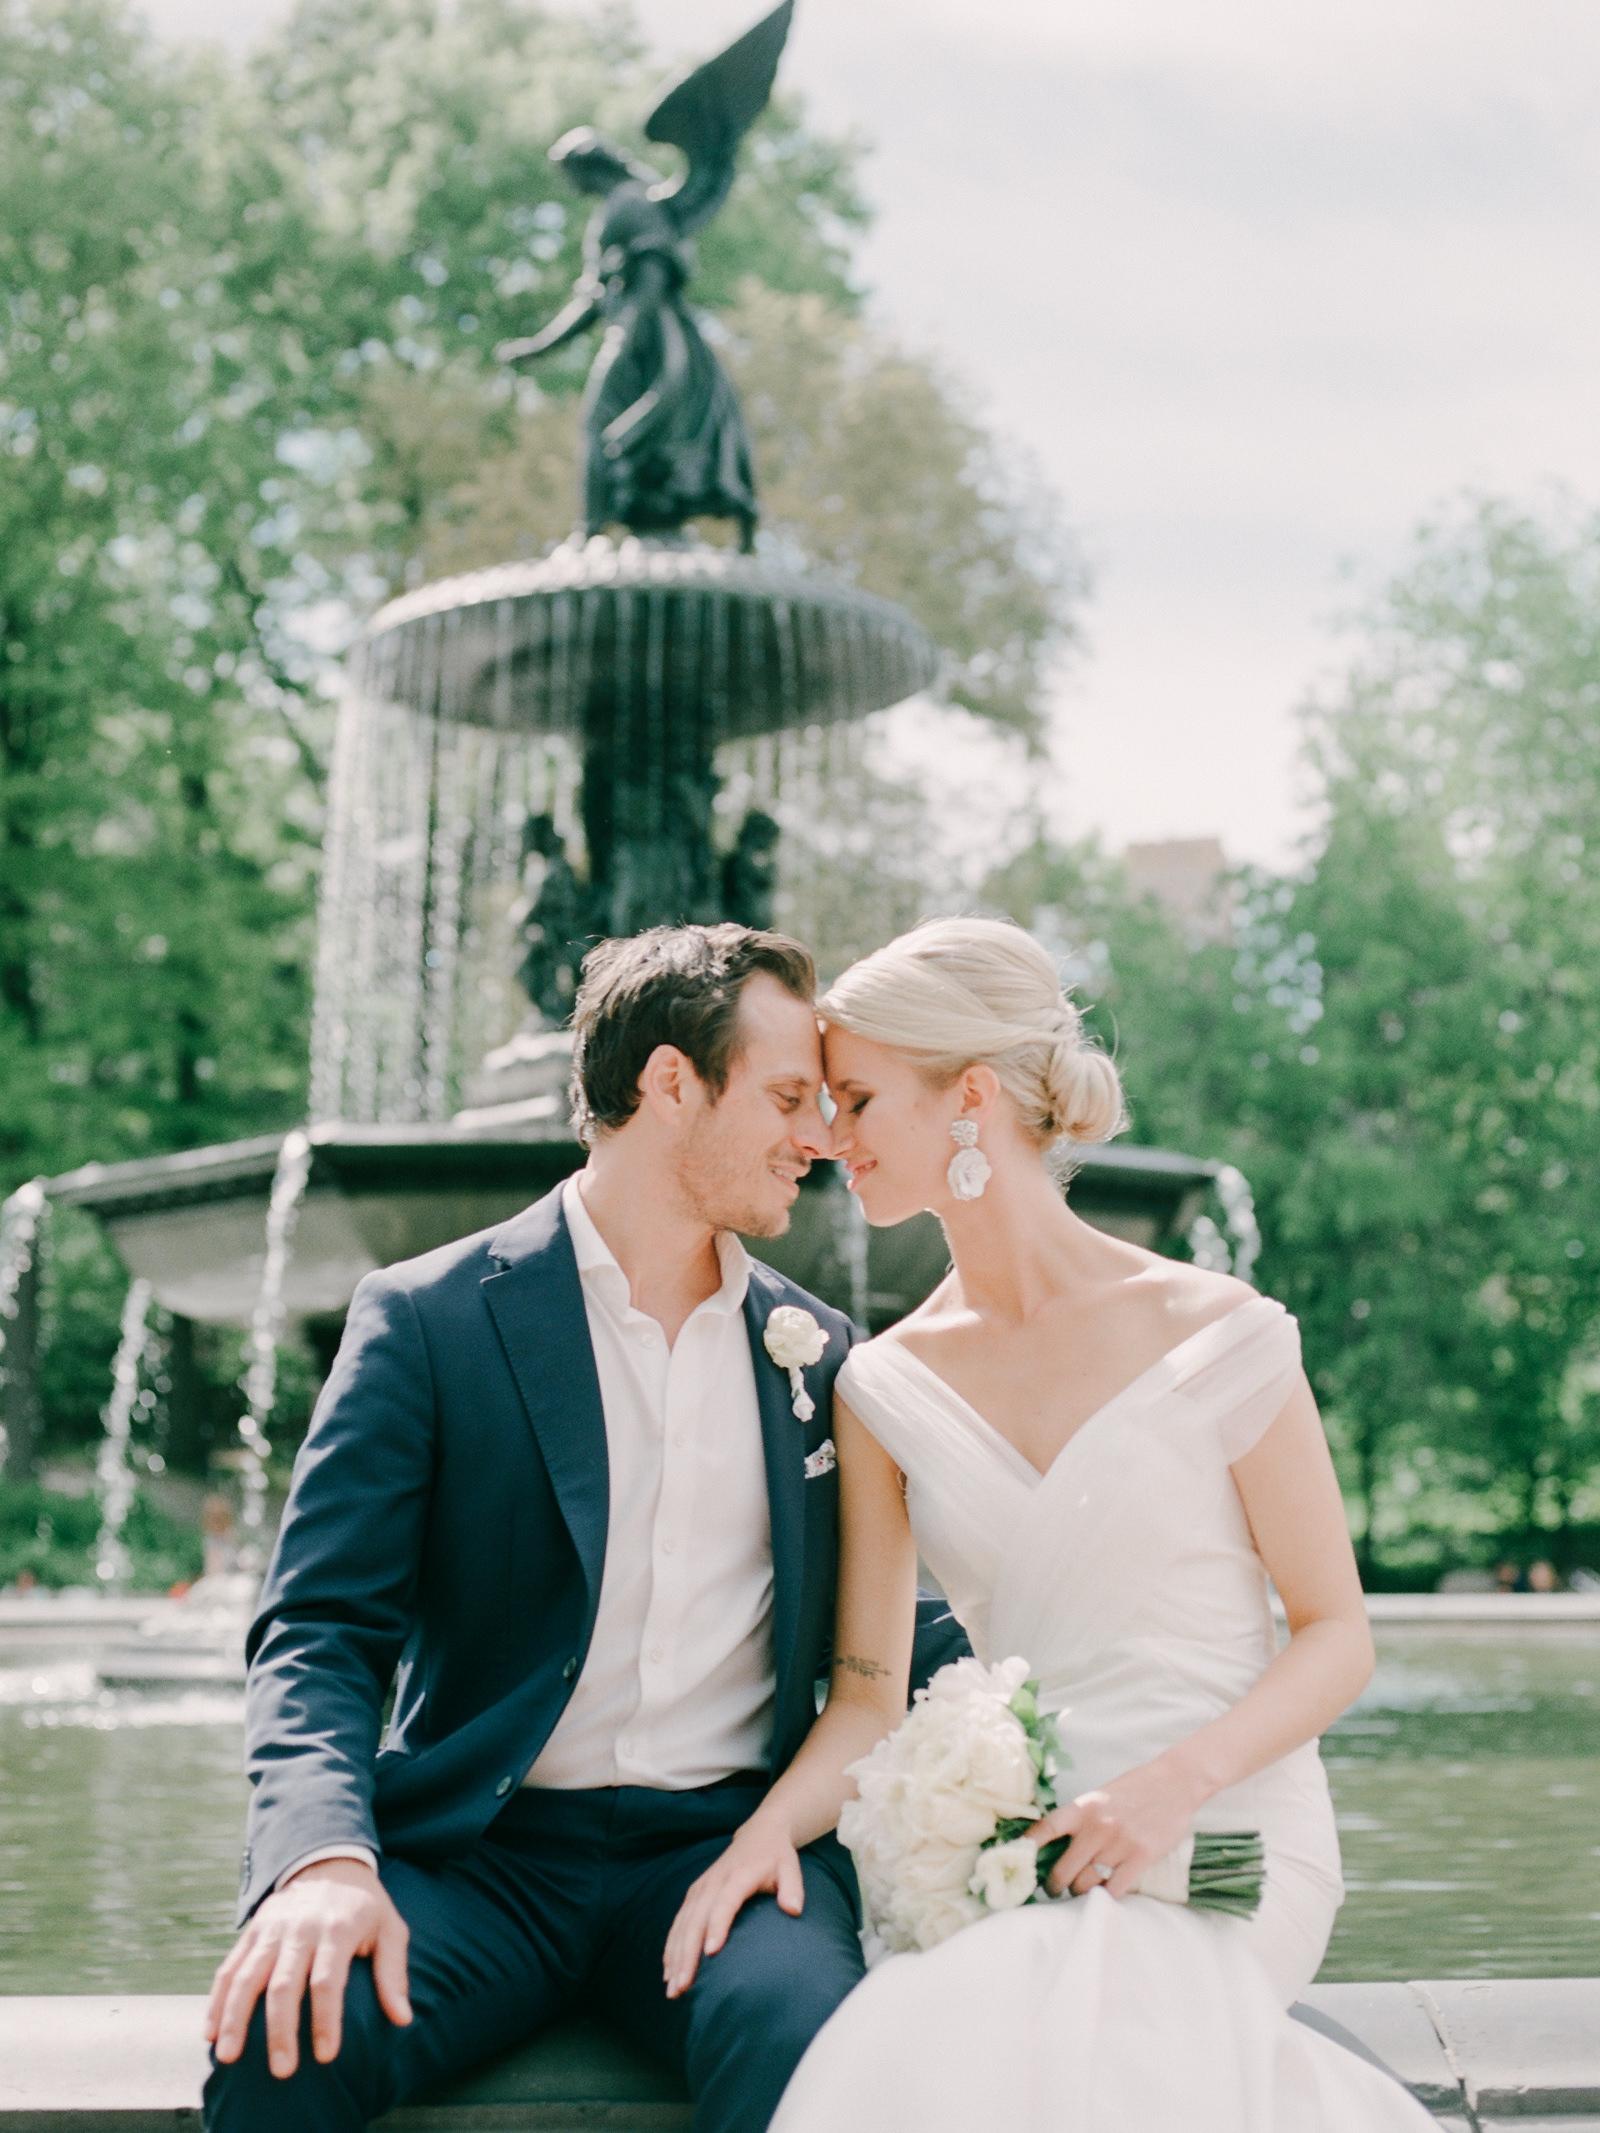 Intimate-NYC_wedding_ by Tanya Isaeva-112.jpg